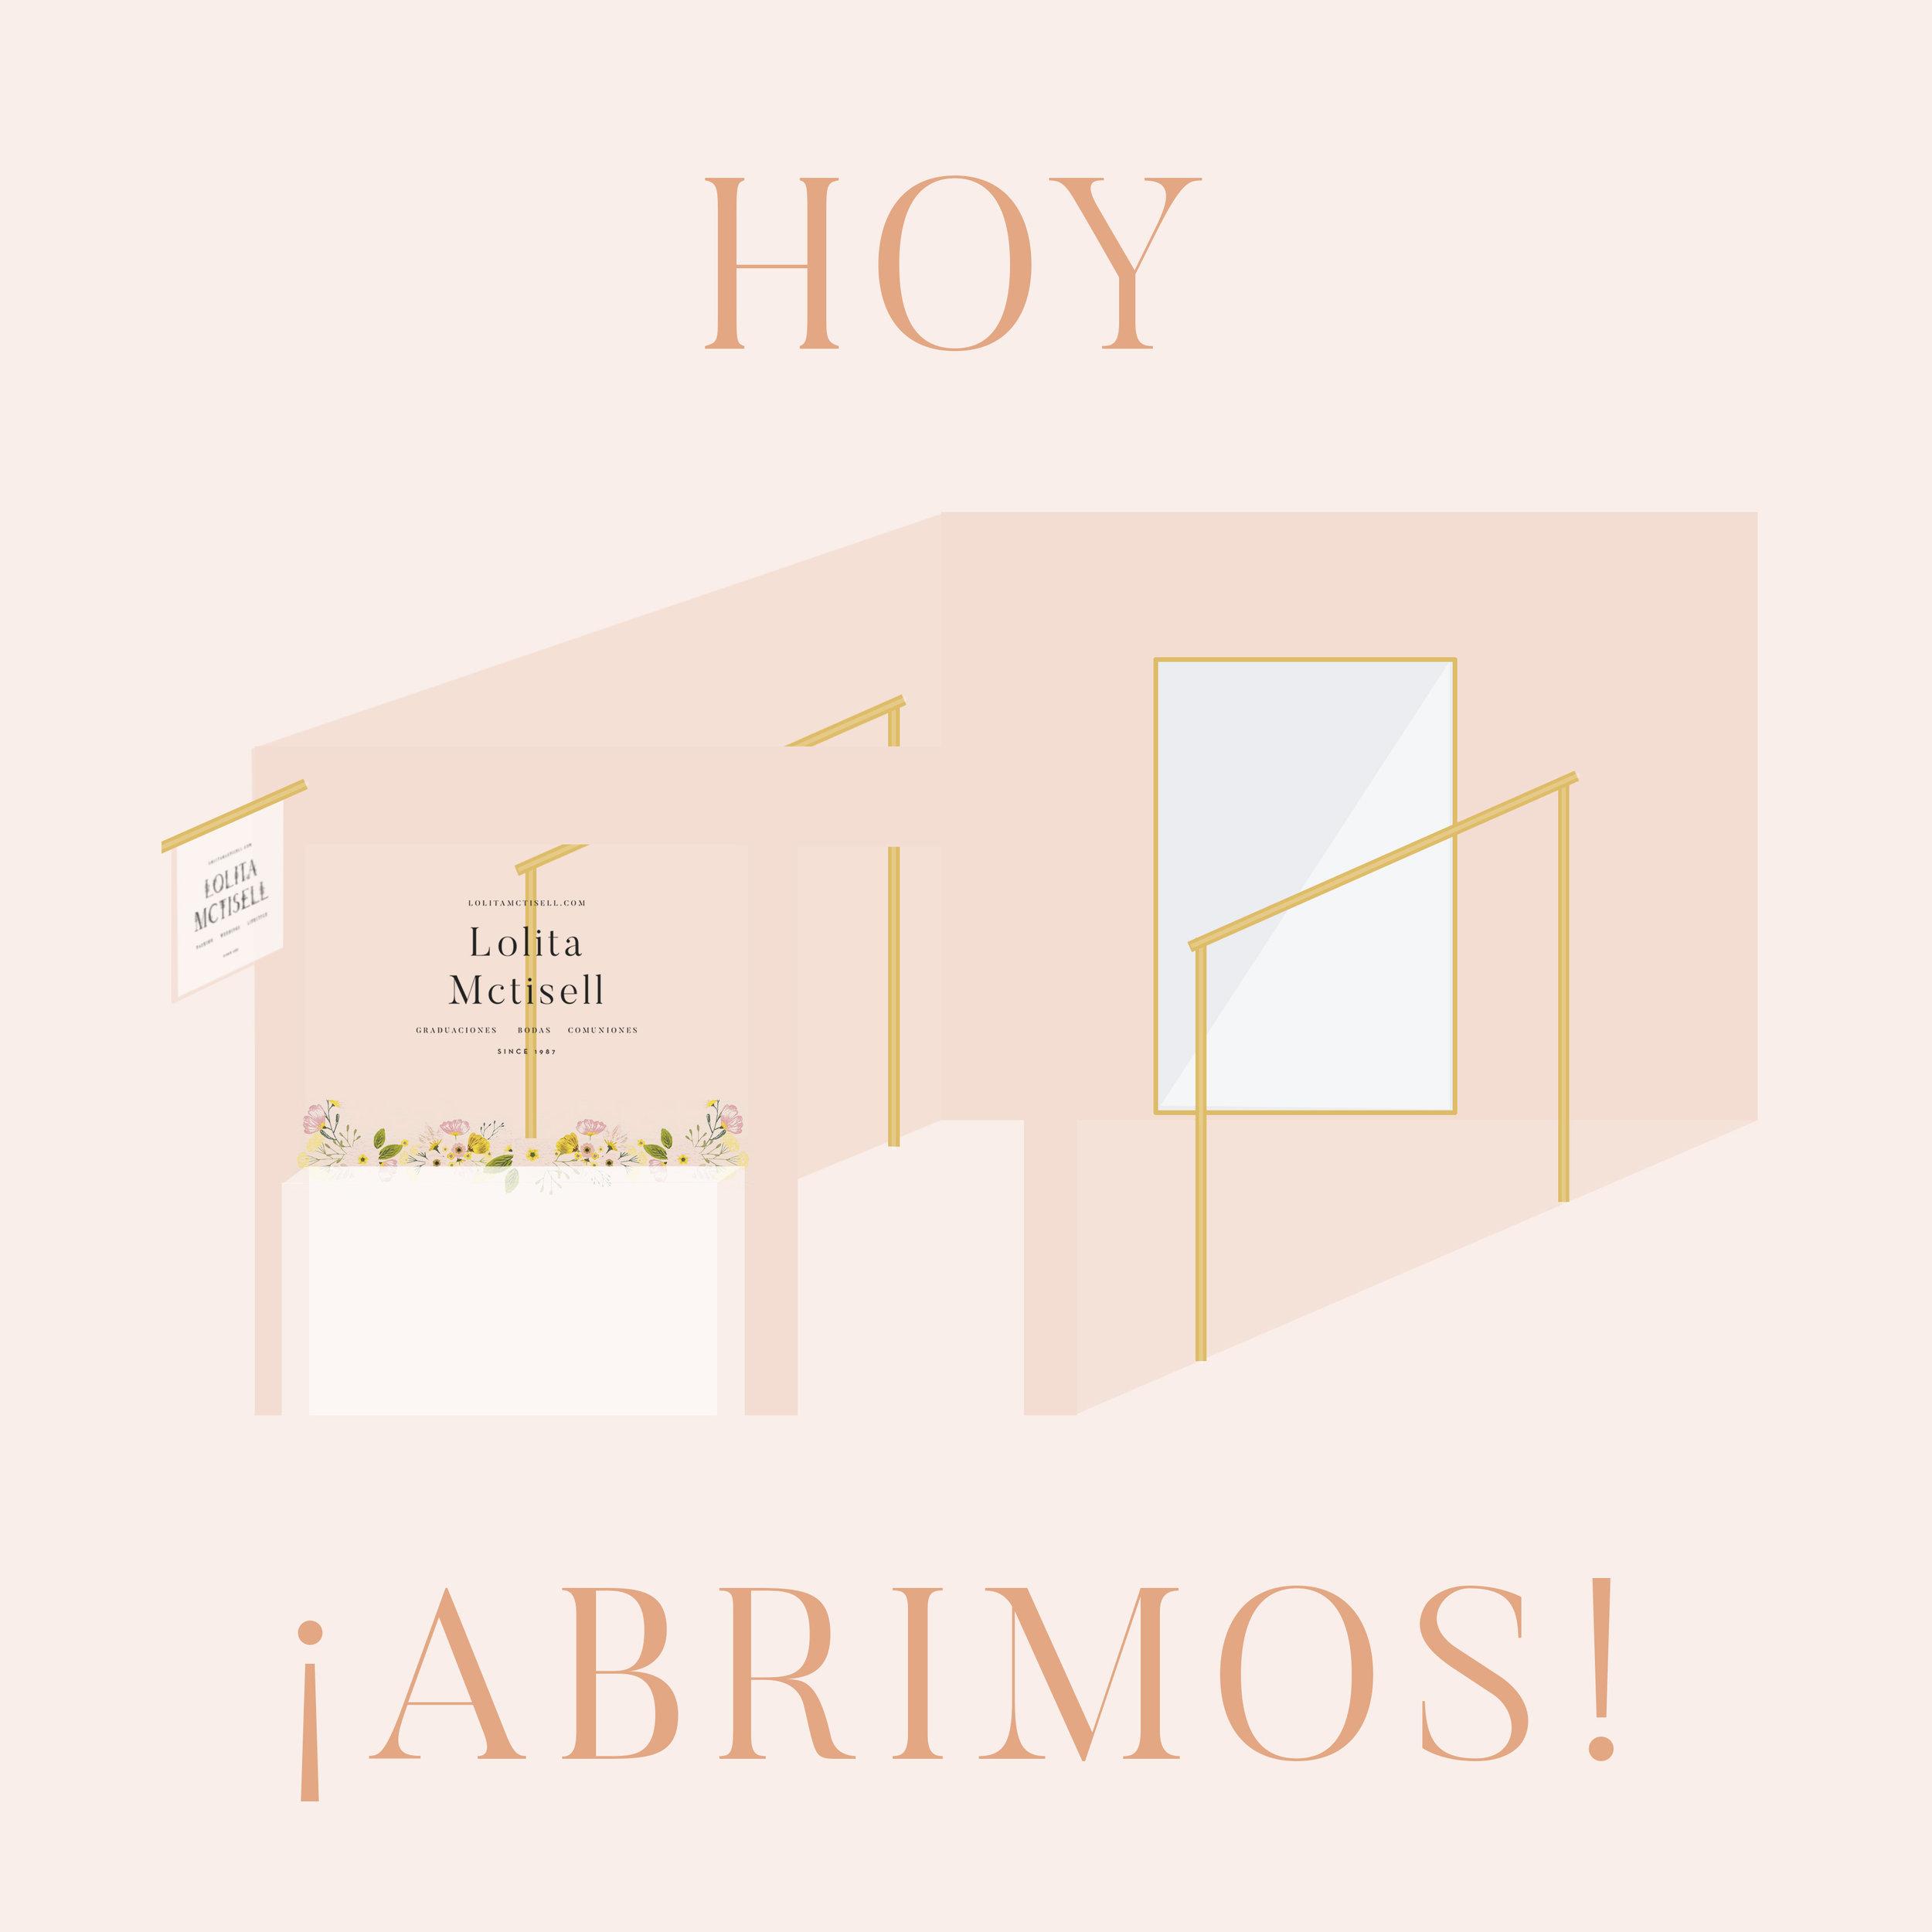 Lolita_Mctisell_open_naranja-ESPAÑOL.jpg